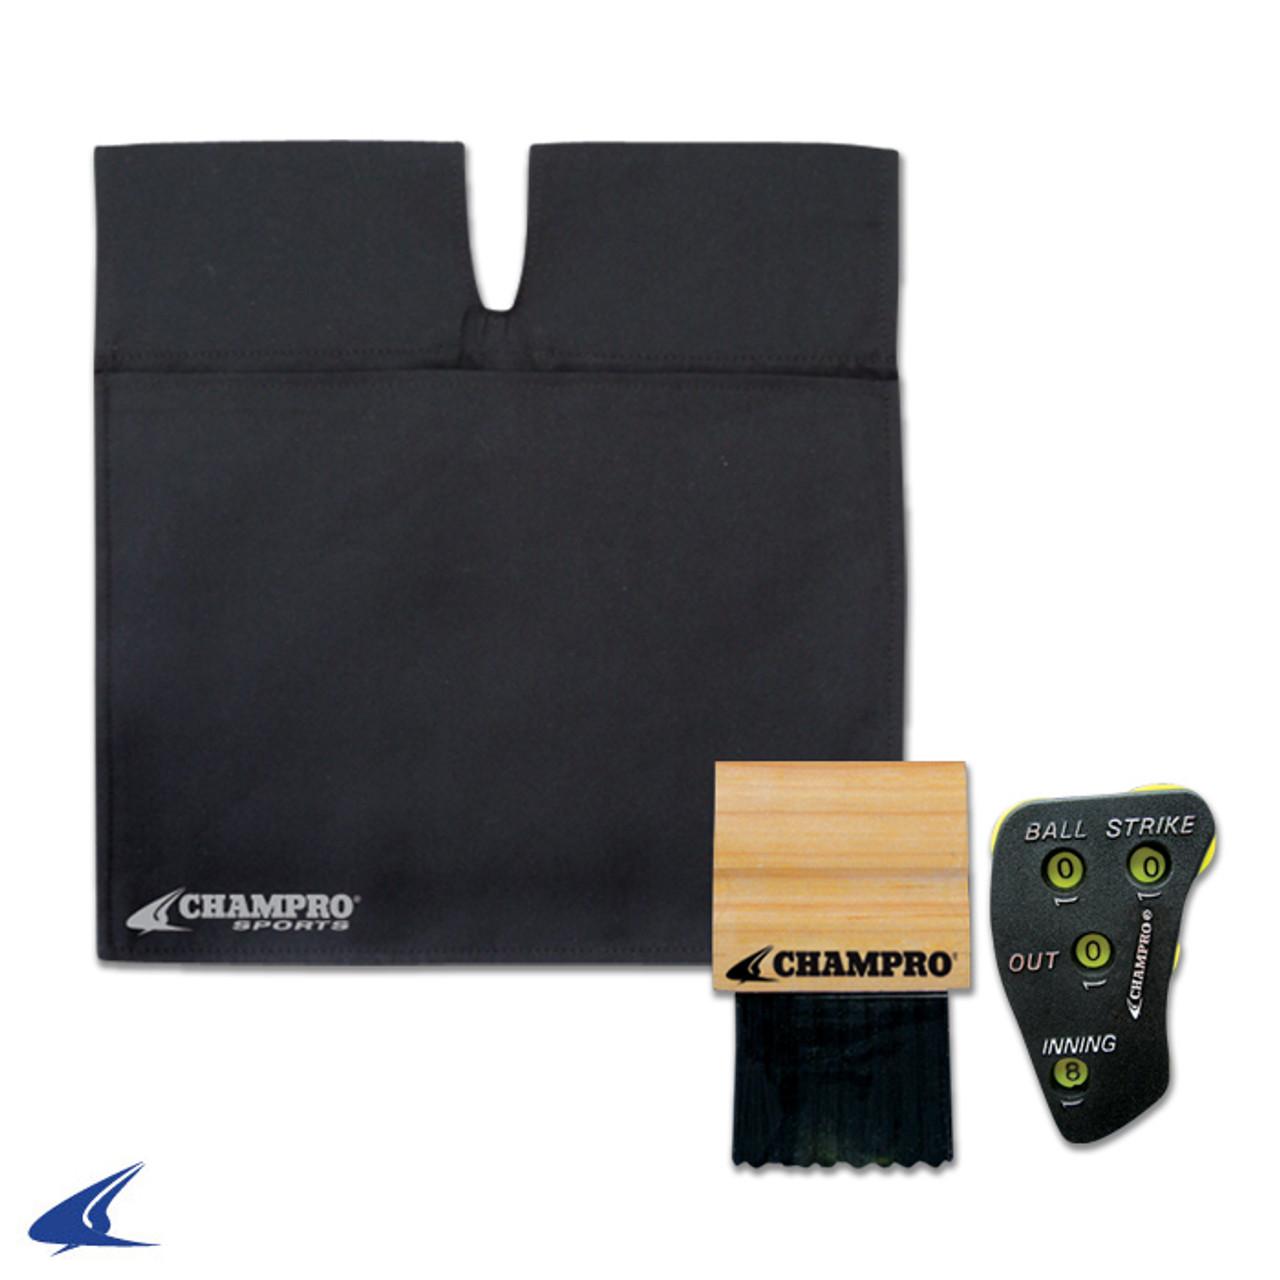 Champro Black Umpire Ball Bag, Wood Brush and 4-dial Indicator